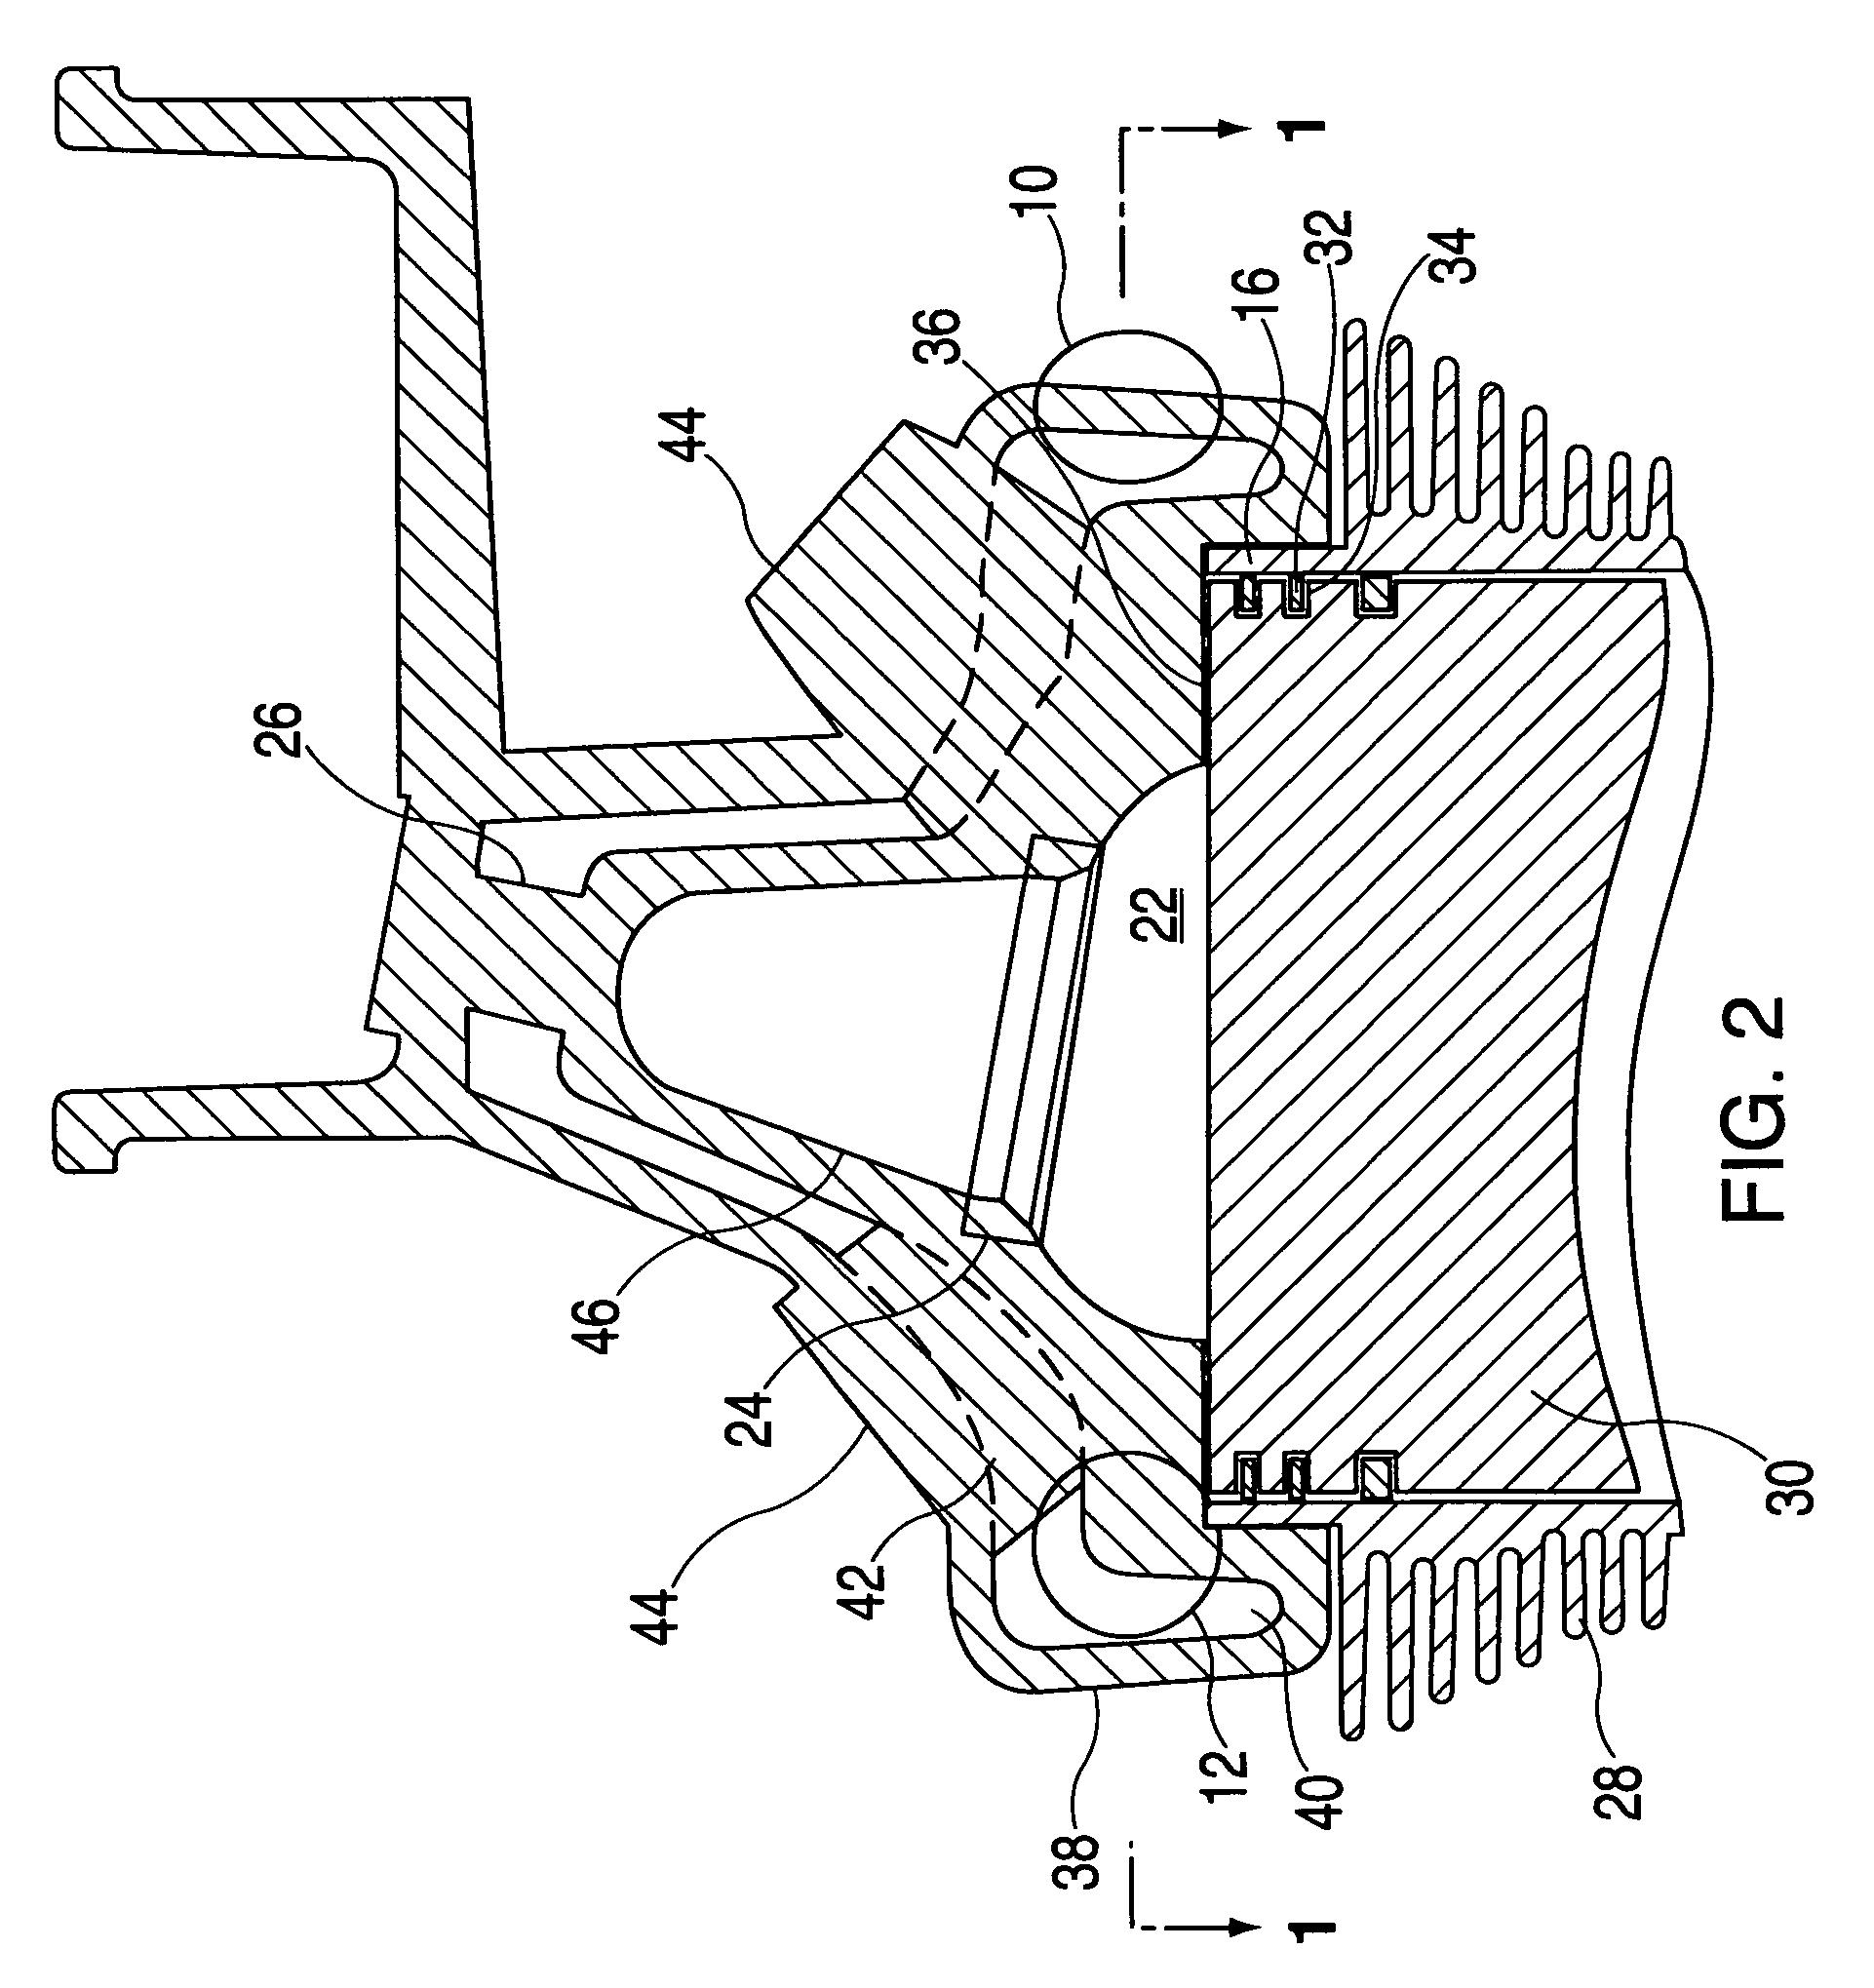 Vw Air Cooled Engine Diagram. Diagram. Auto Parts Catalog